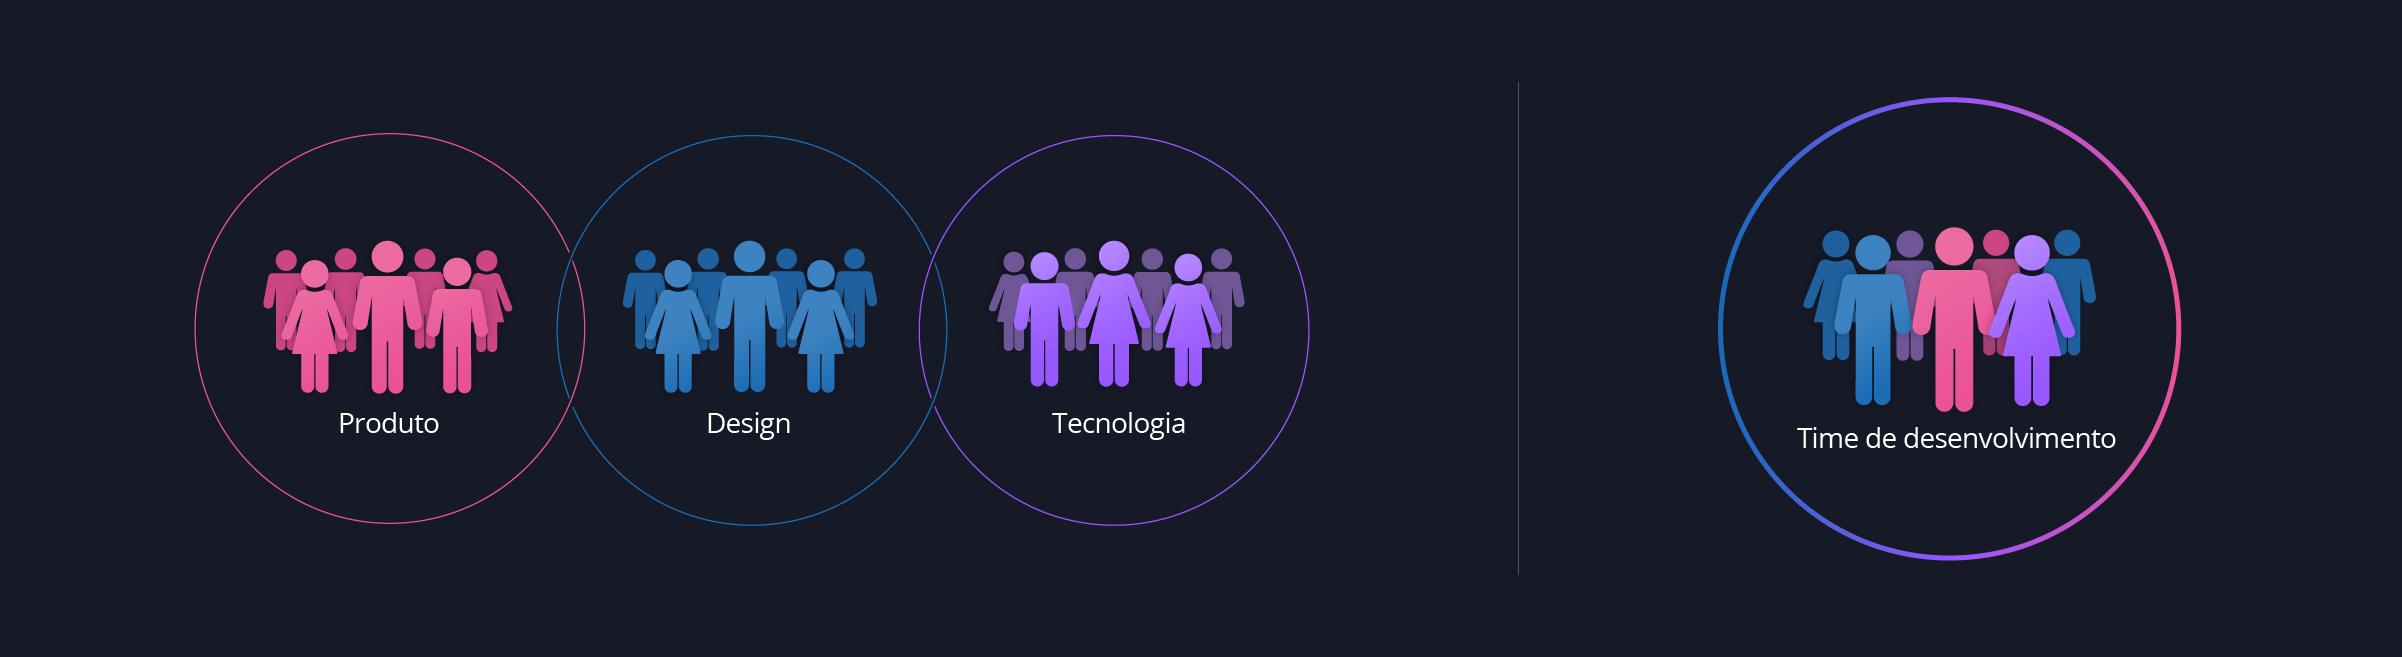 Diagrama – Times multidisciplinares